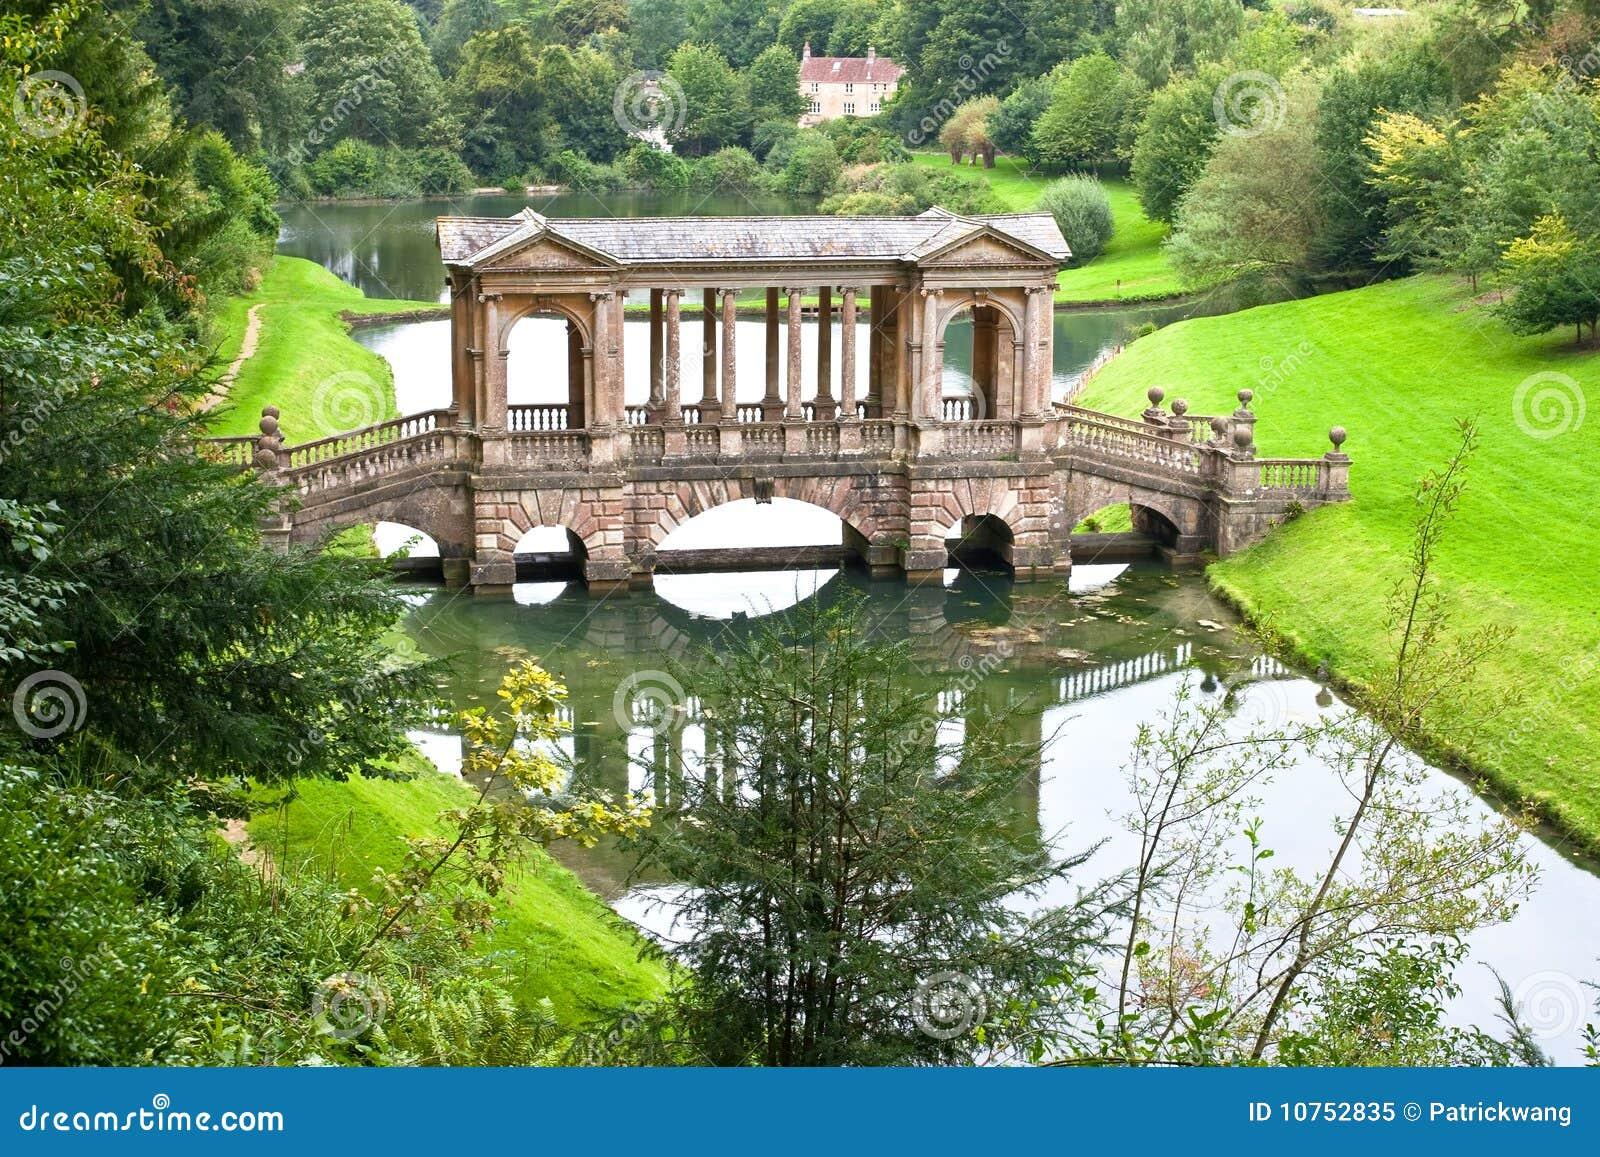 Landscape Garden Four Marks : Palladian bridge in prior park landscape garden royalty